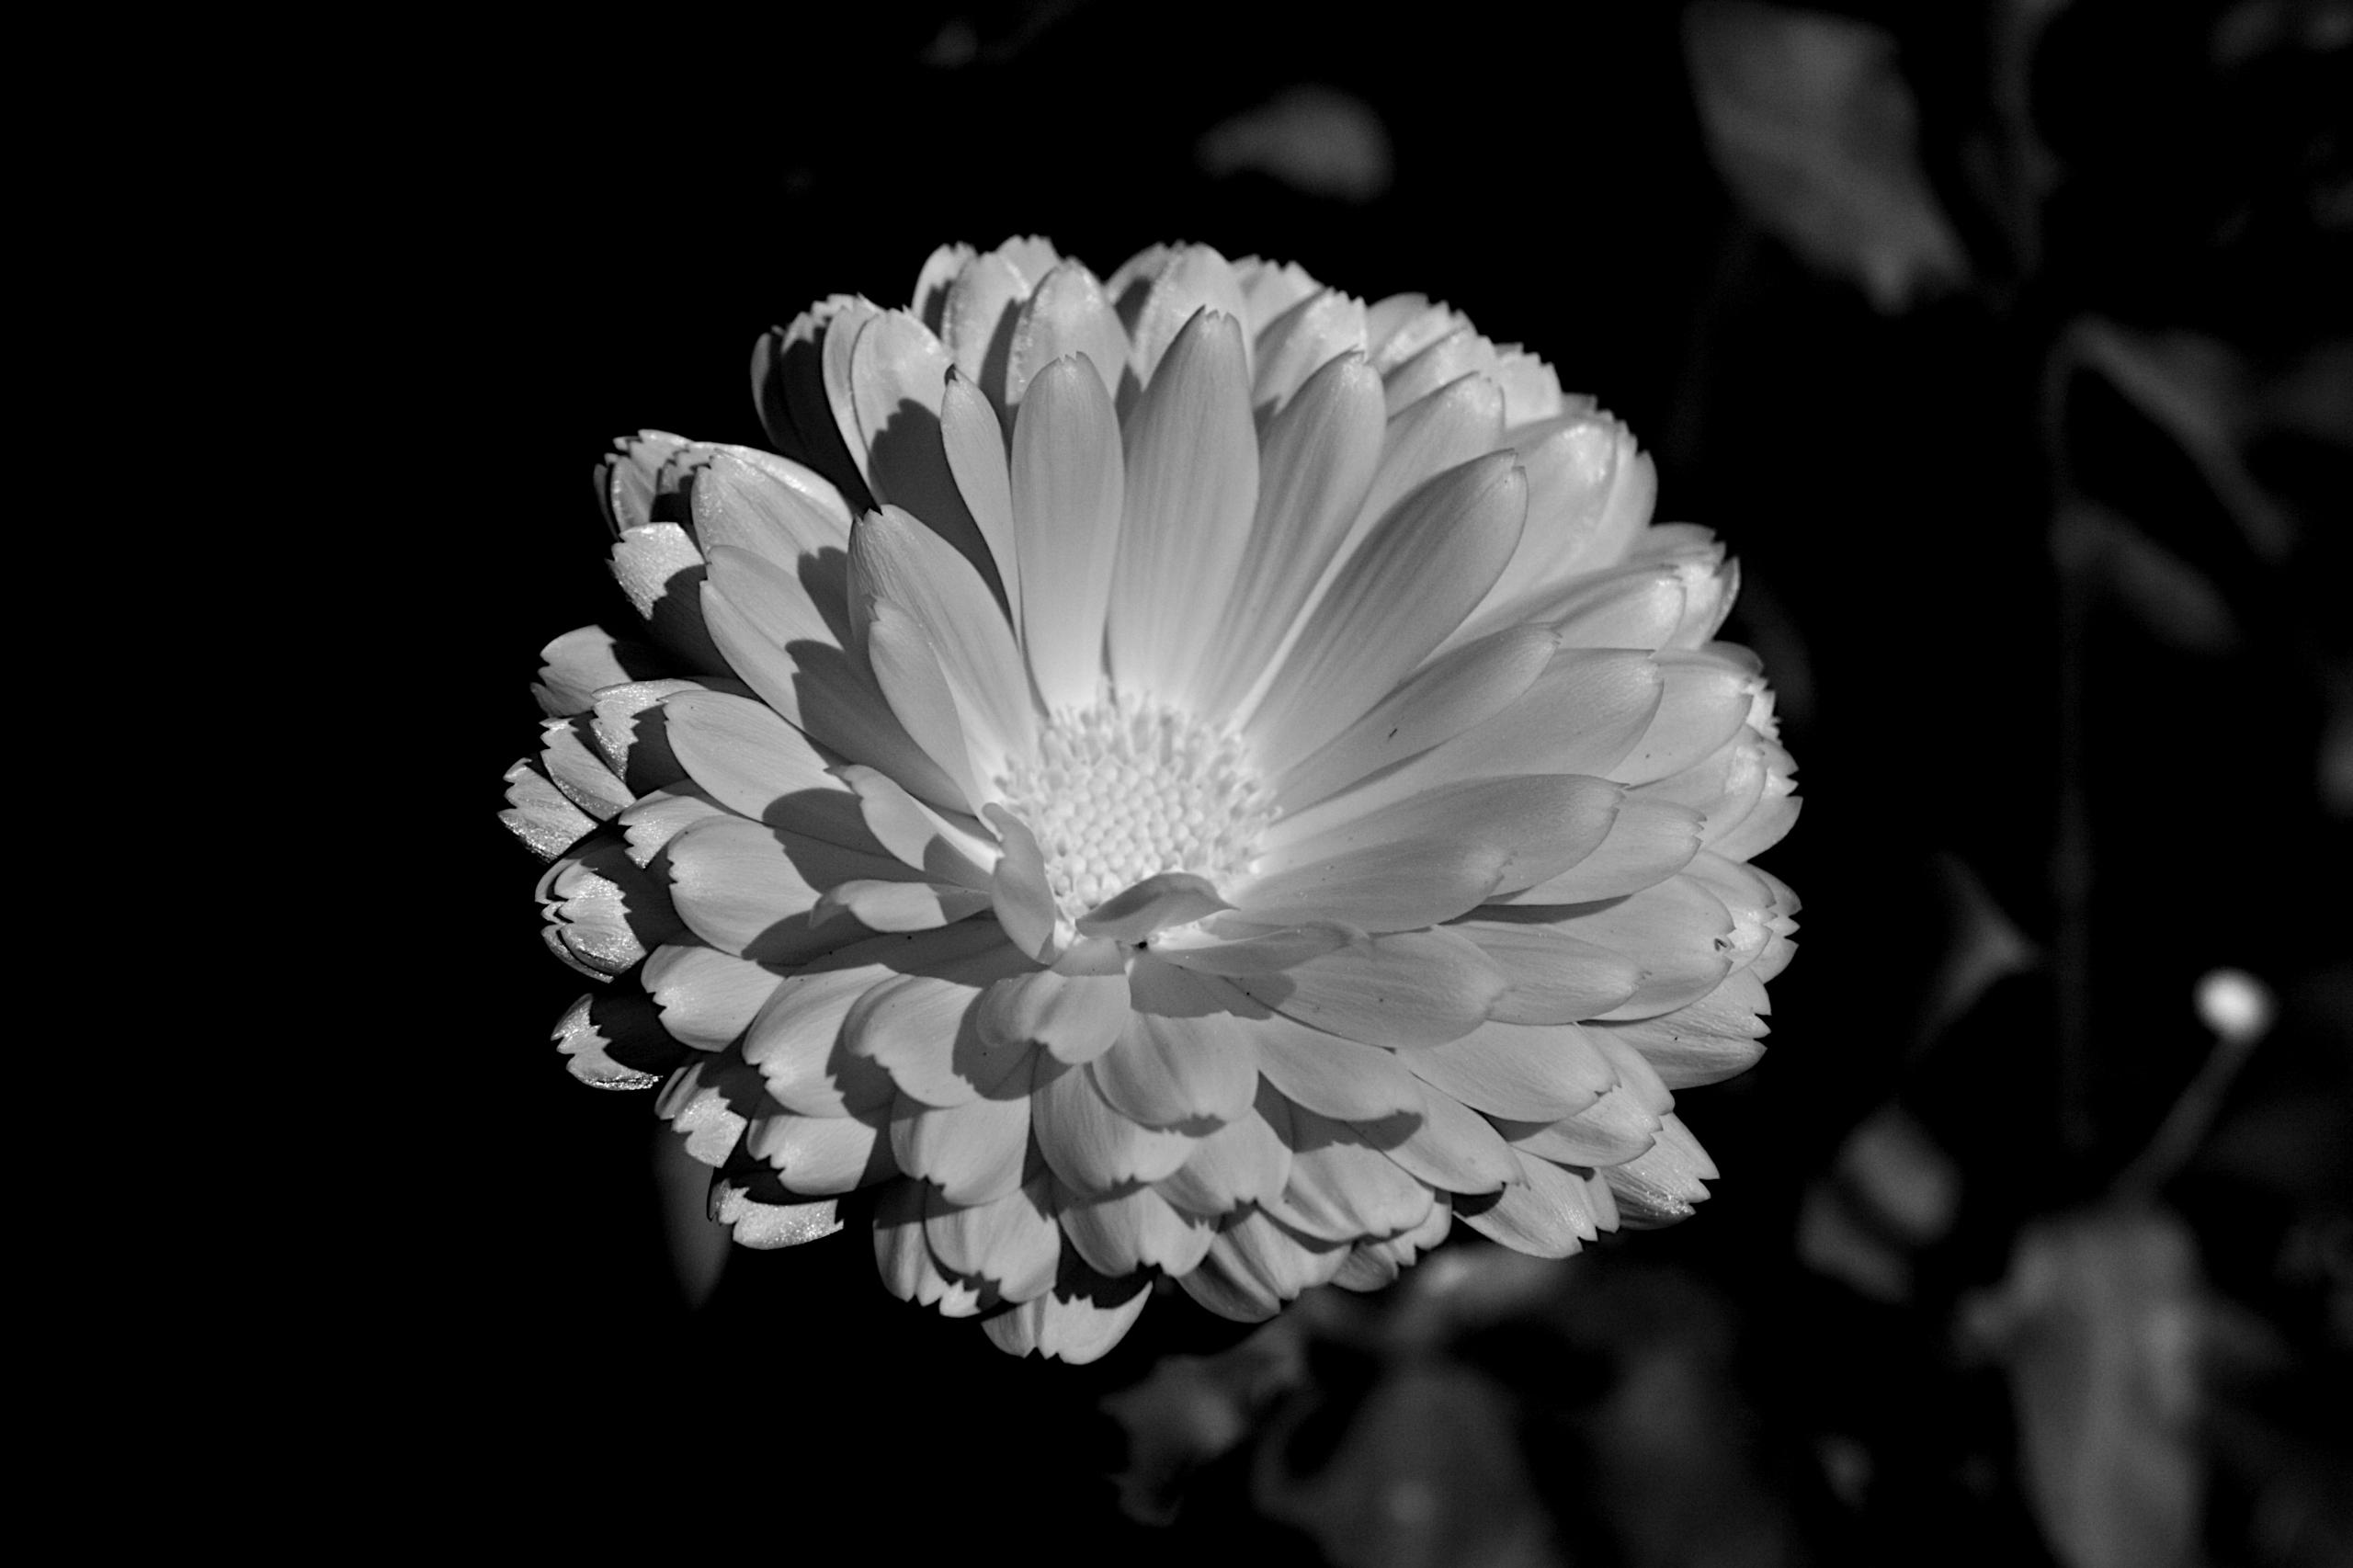 Botanical Monochrome 8858 - flowerphotography - dorian-stretton   ello